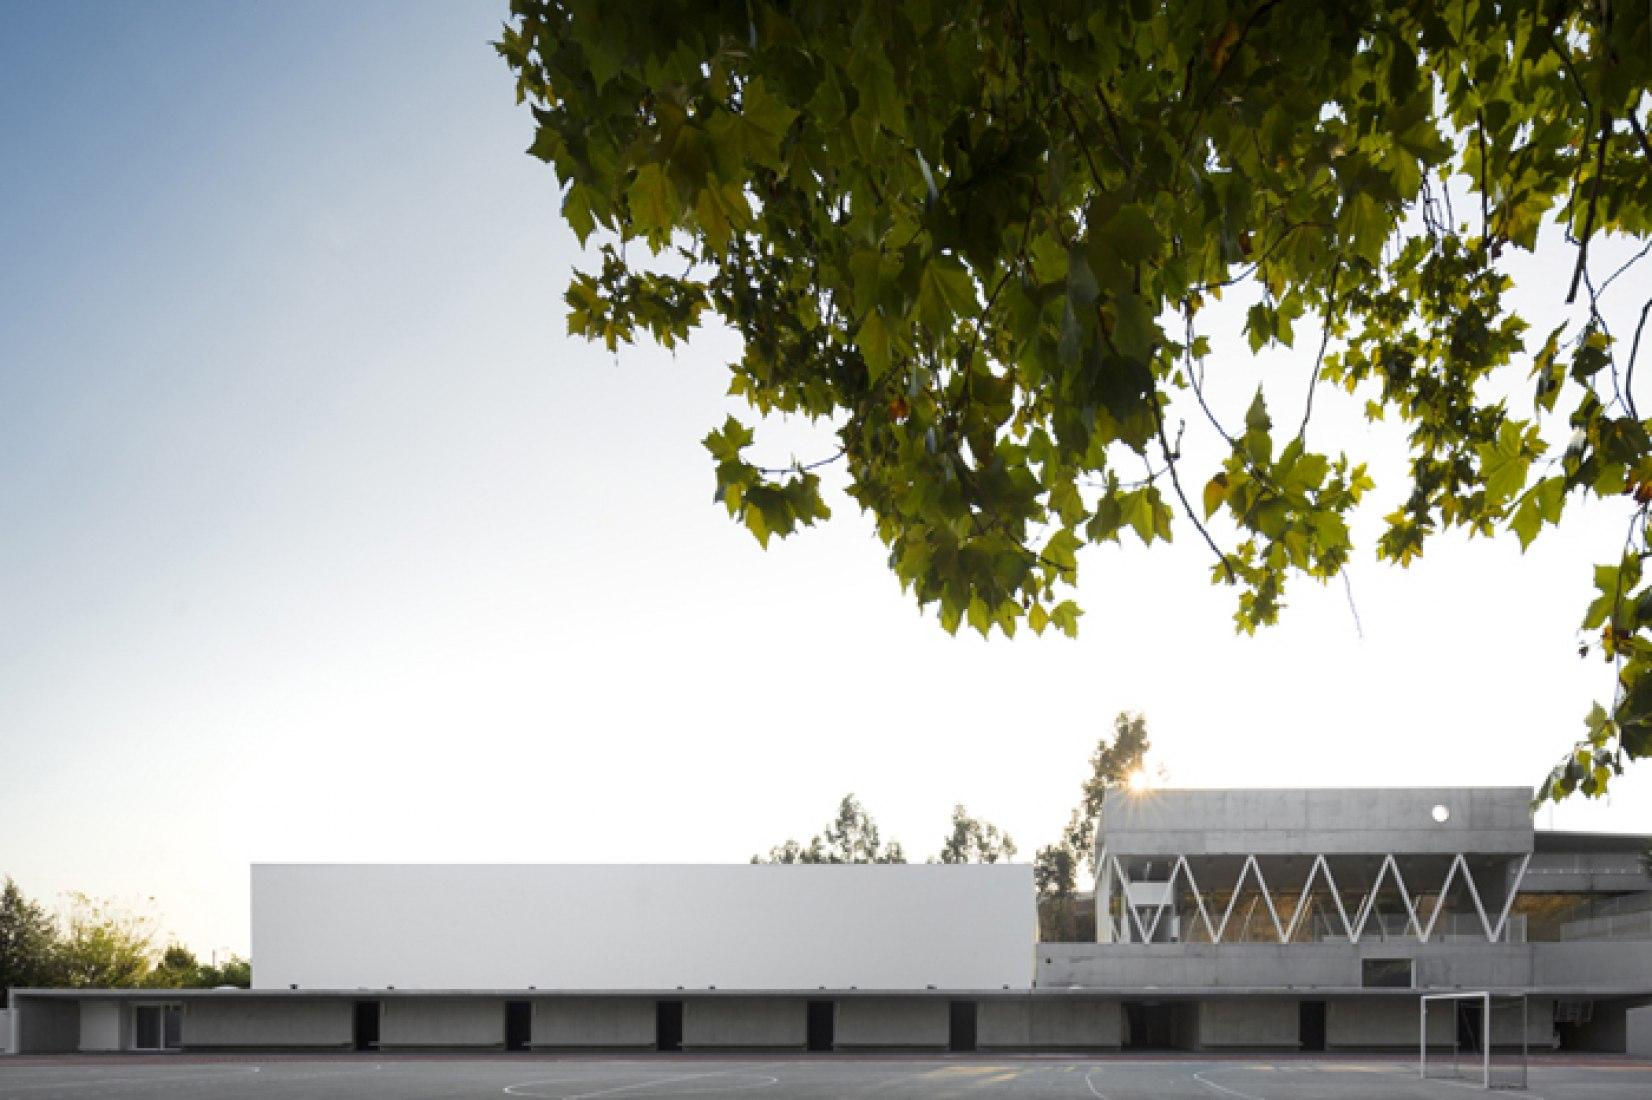 Escuela primaria y secundaria de server Do Vouga por Pedro Domingos Arquitectos. Fotografía © Fernando Guerra | FG+SG.